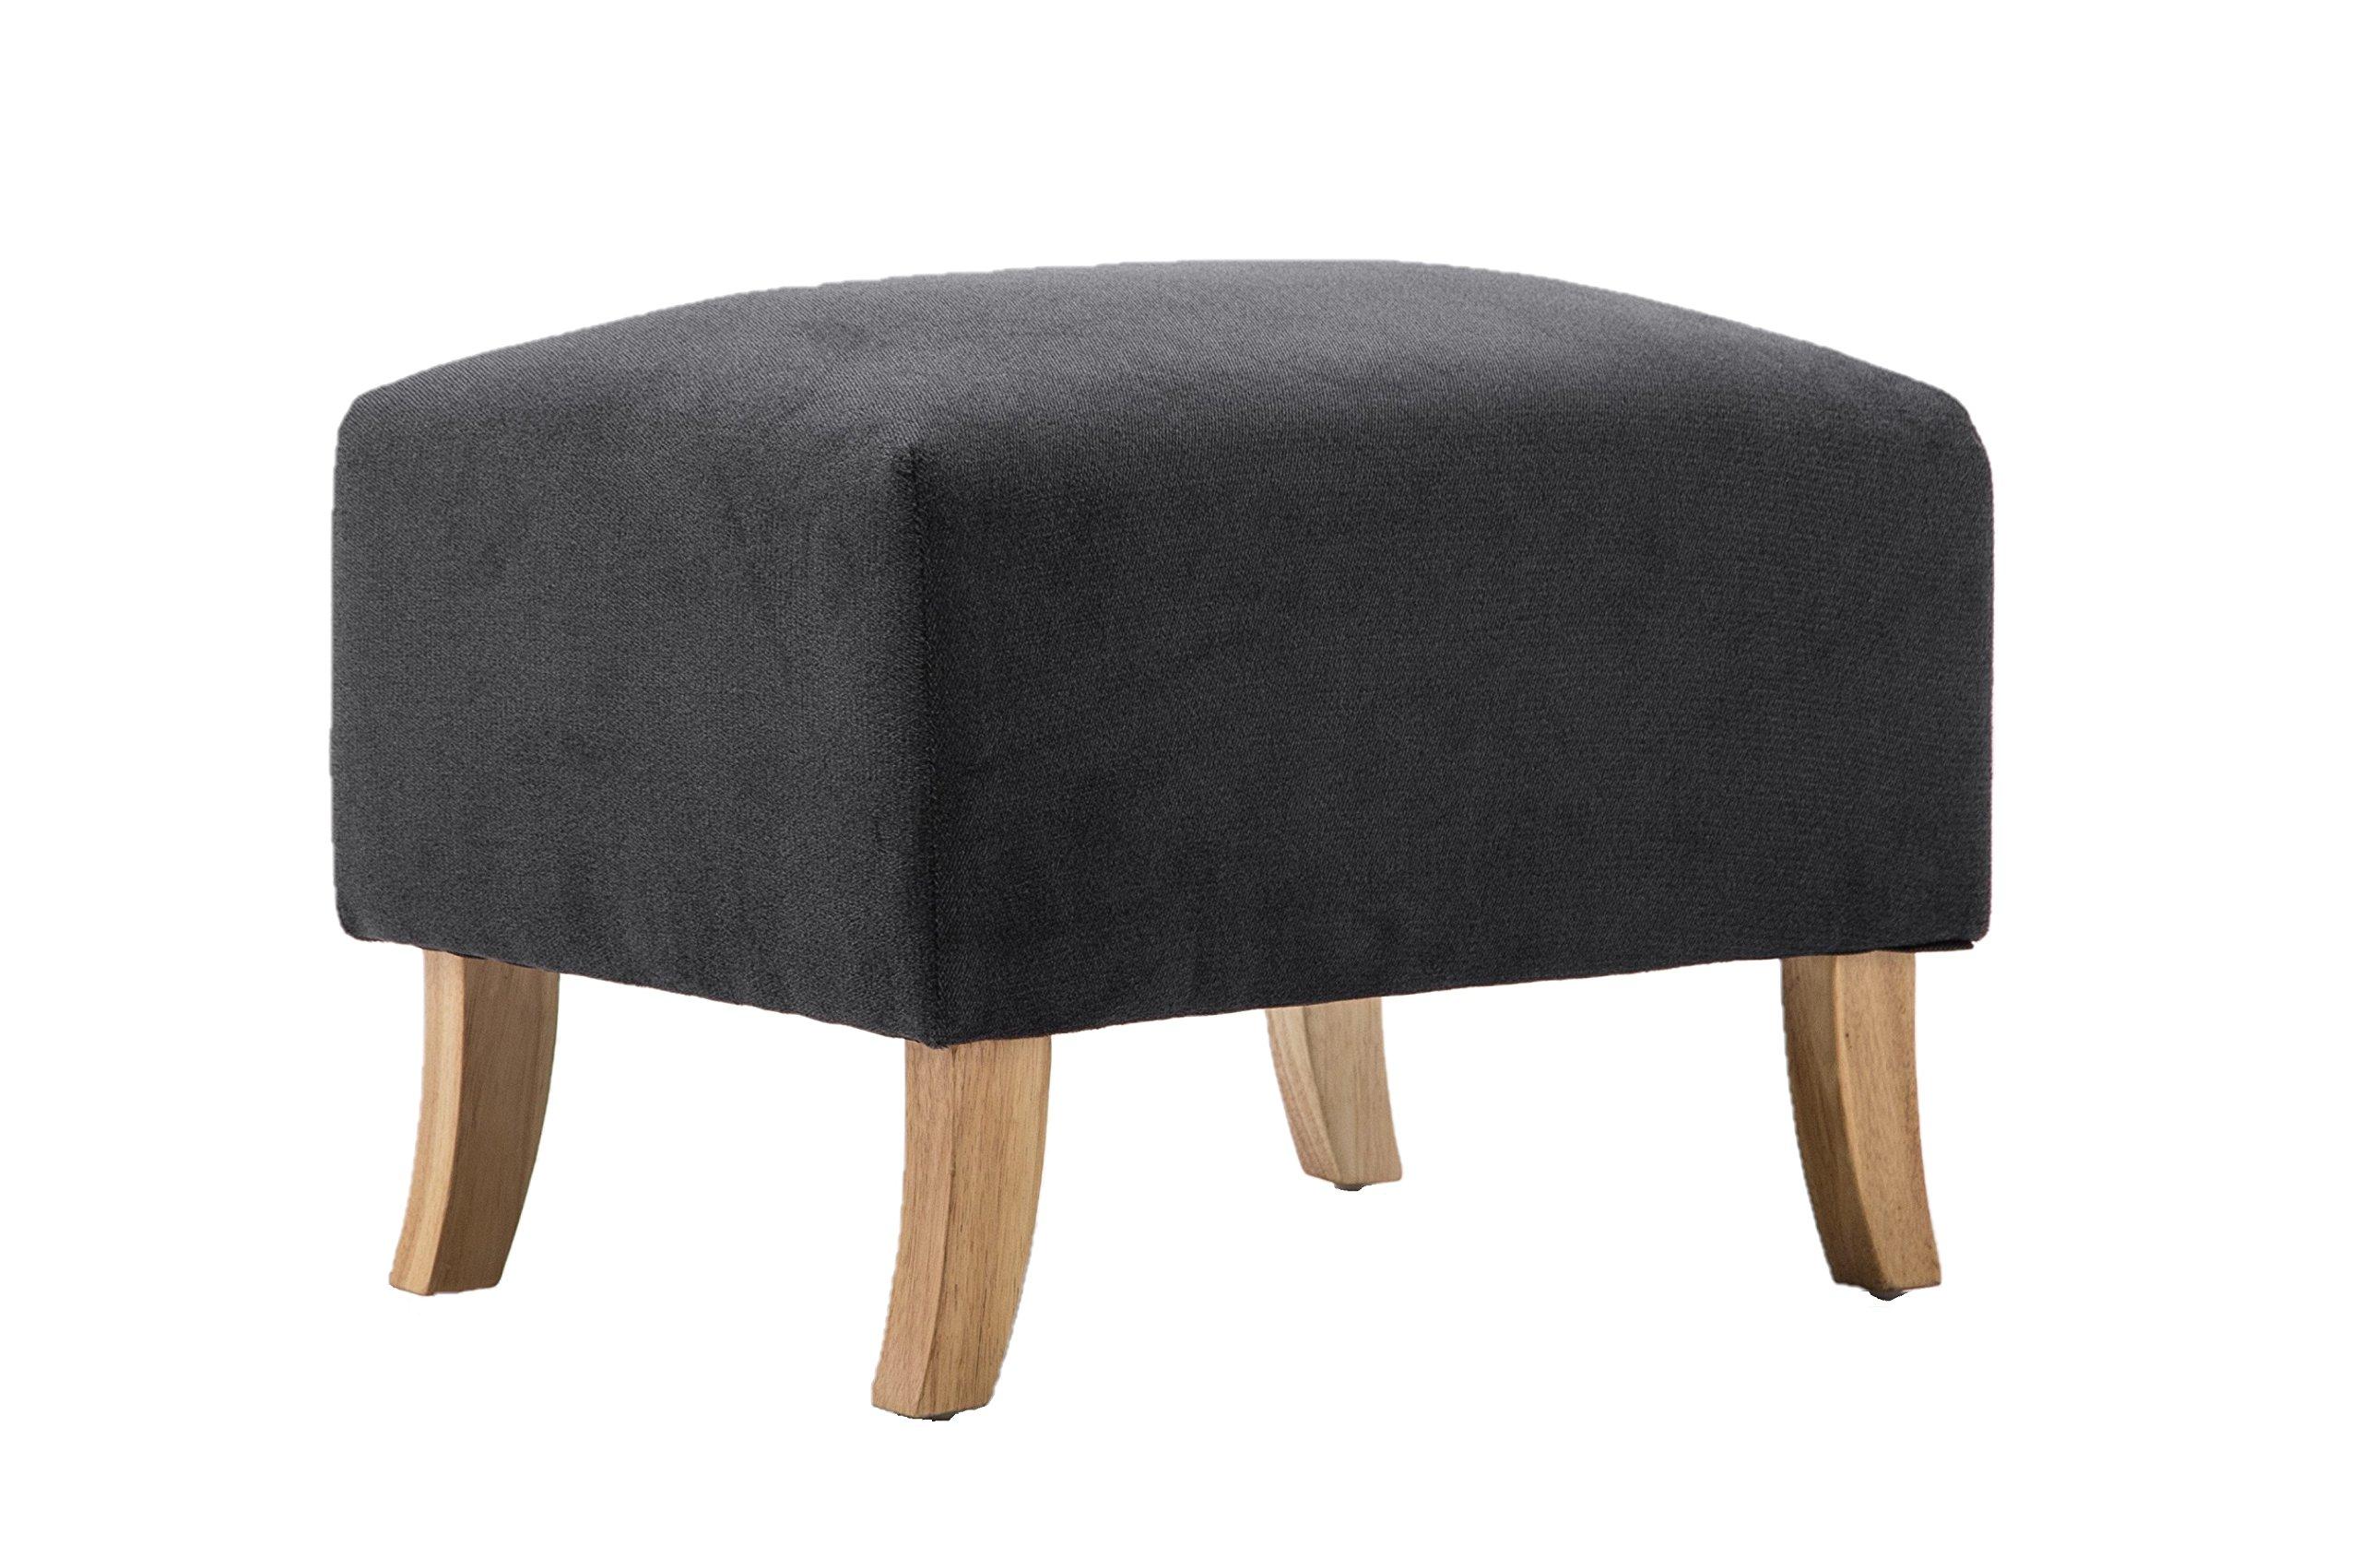 MCombo Ottoman Chair (Gray)